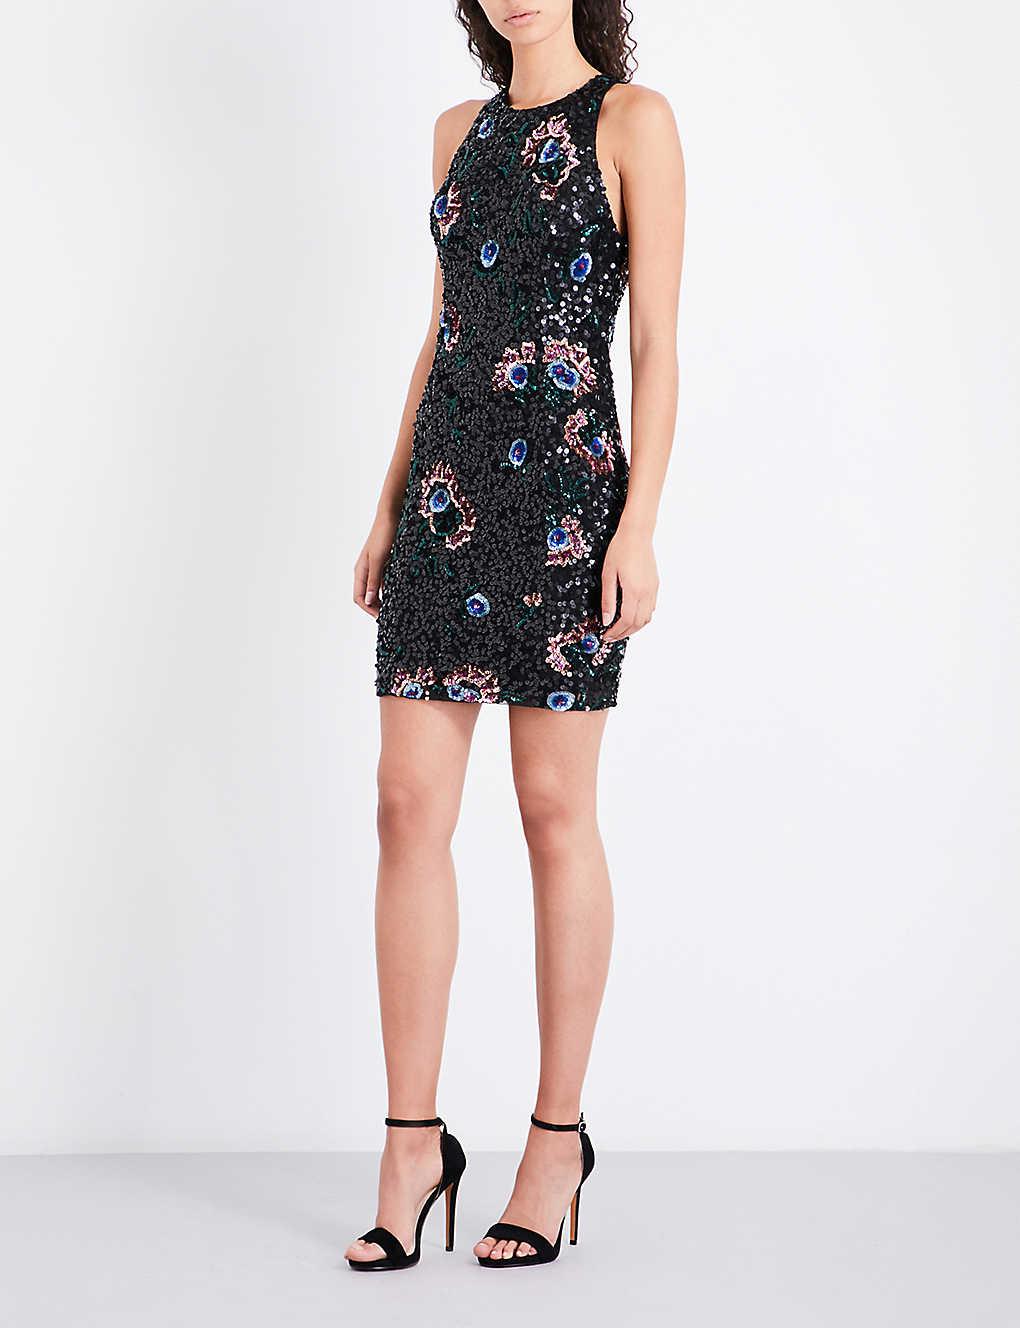 00e981a7a24 FRENCH CONNECTION - Valerie Sparkle sequinned dress | Selfridges.com